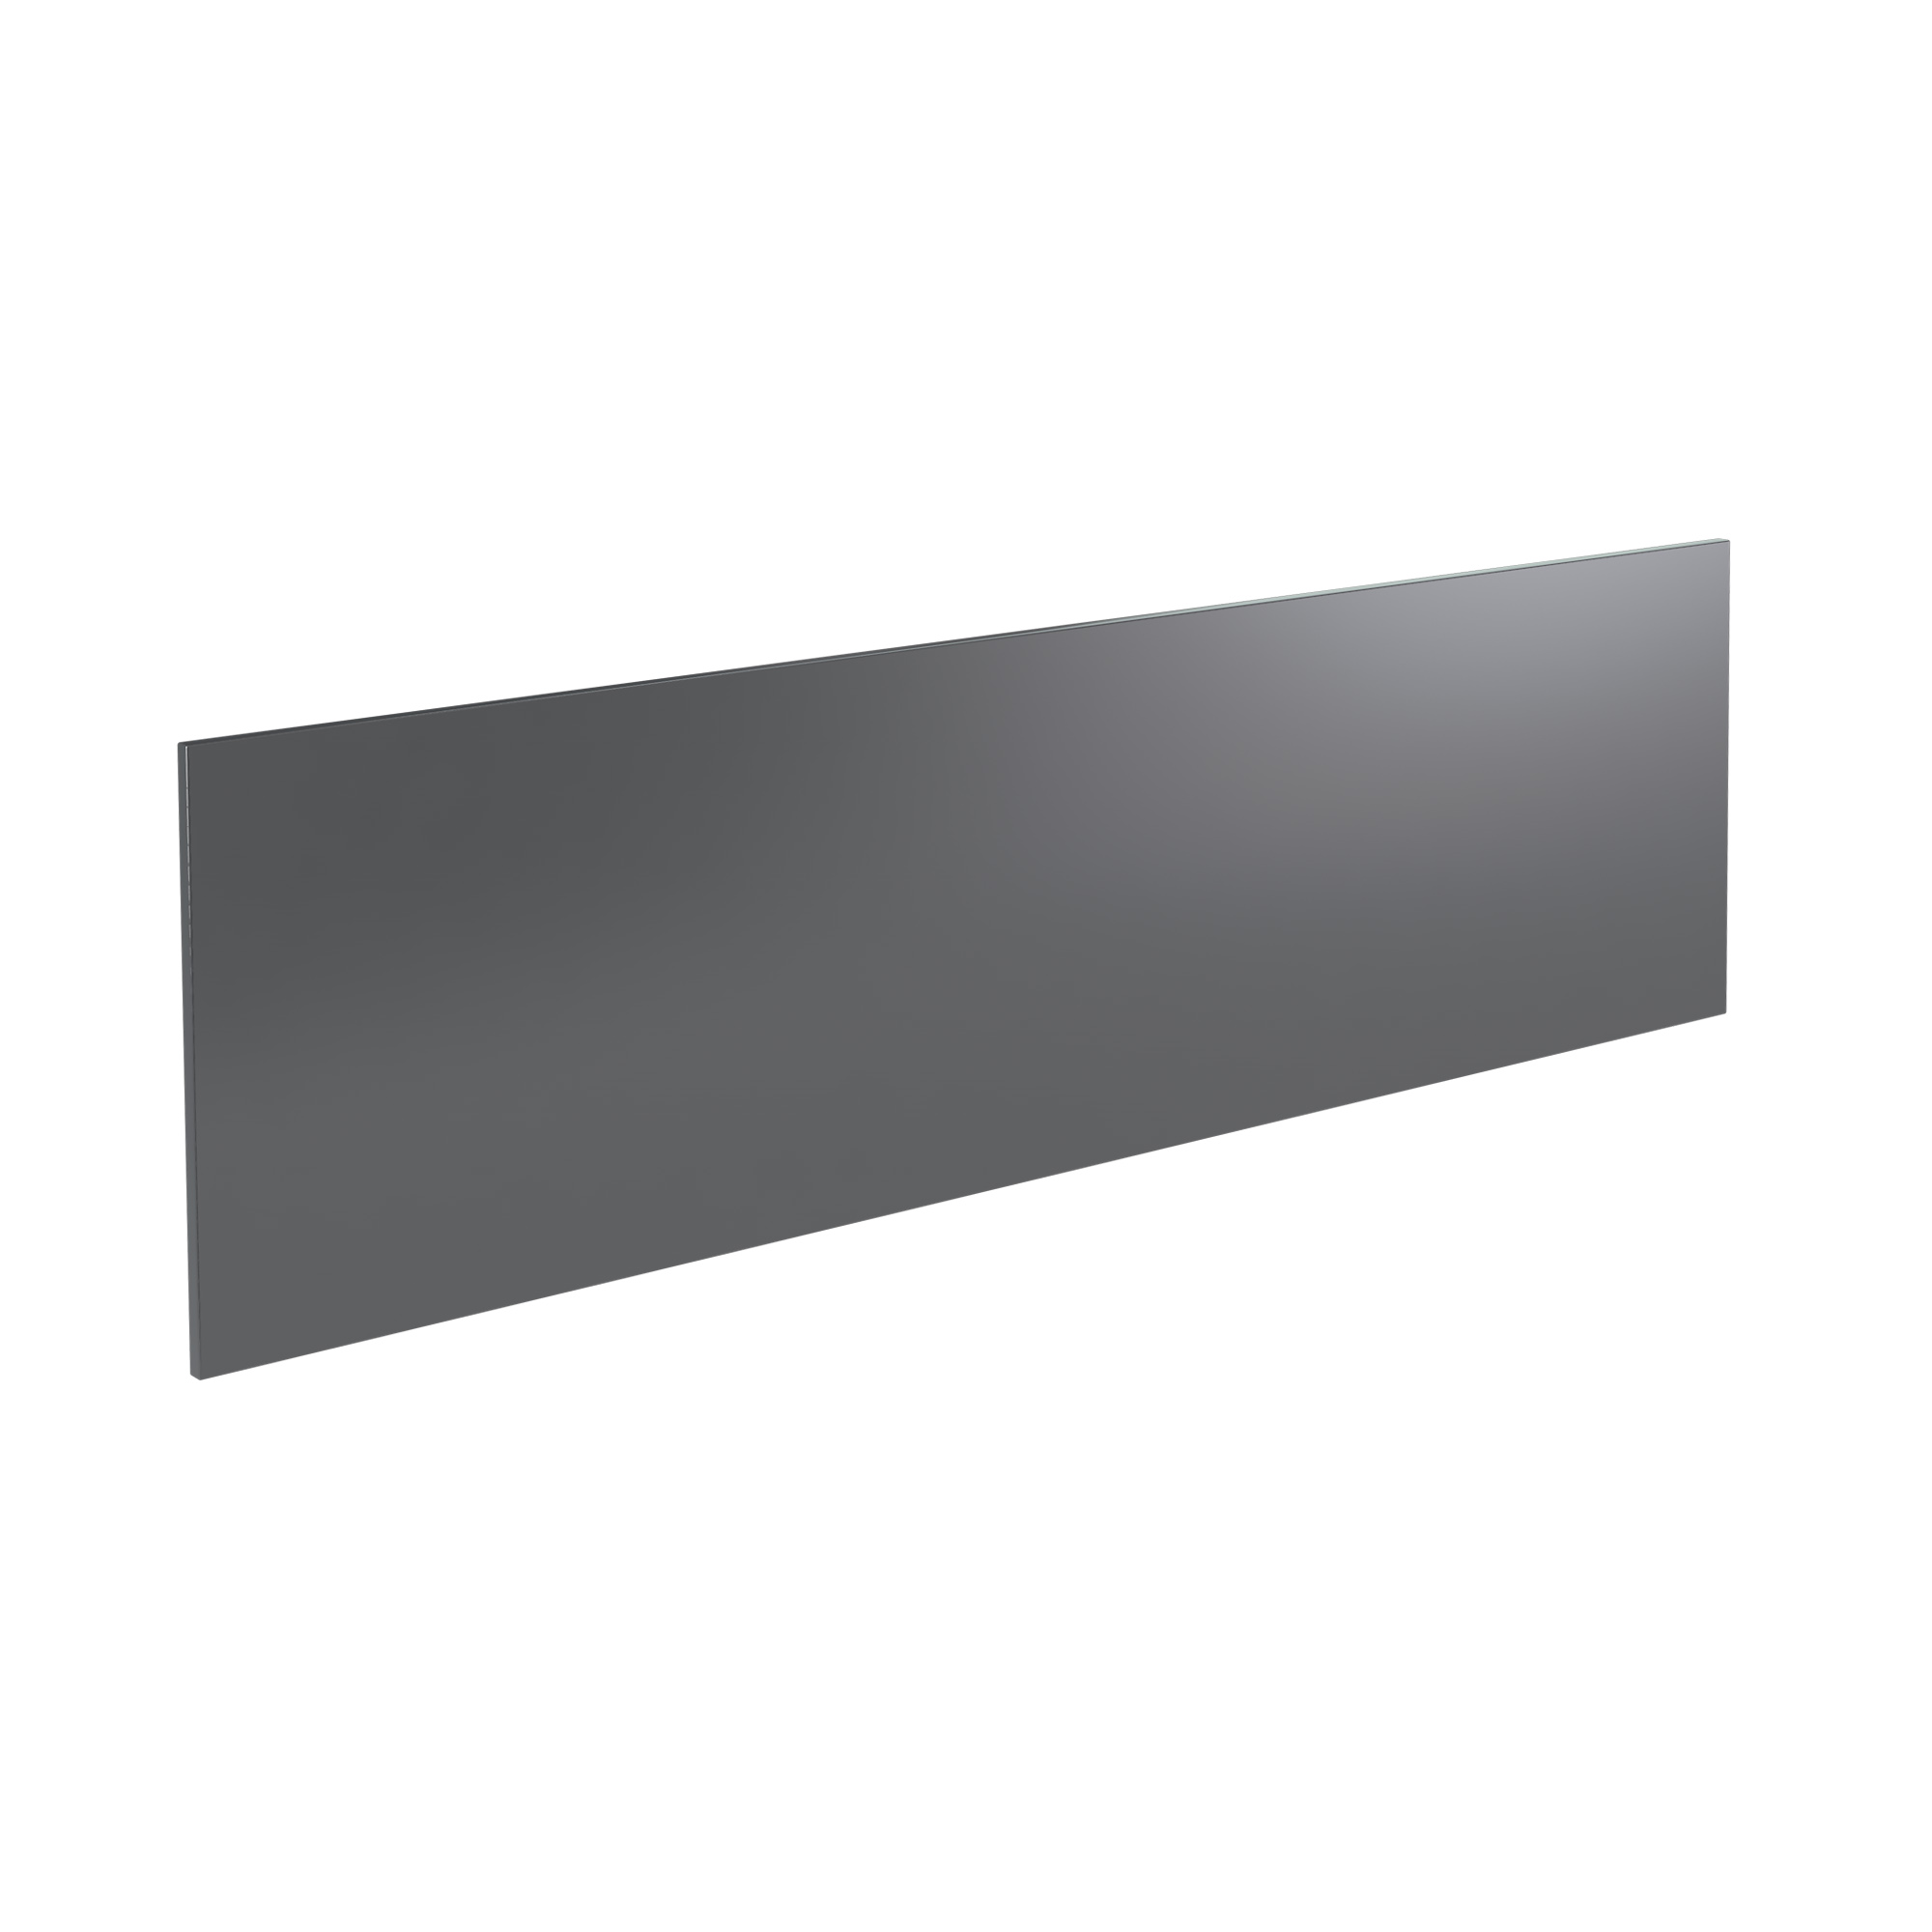 K-Vit Ikon 1800mm Bath Panel - Gloss Grey